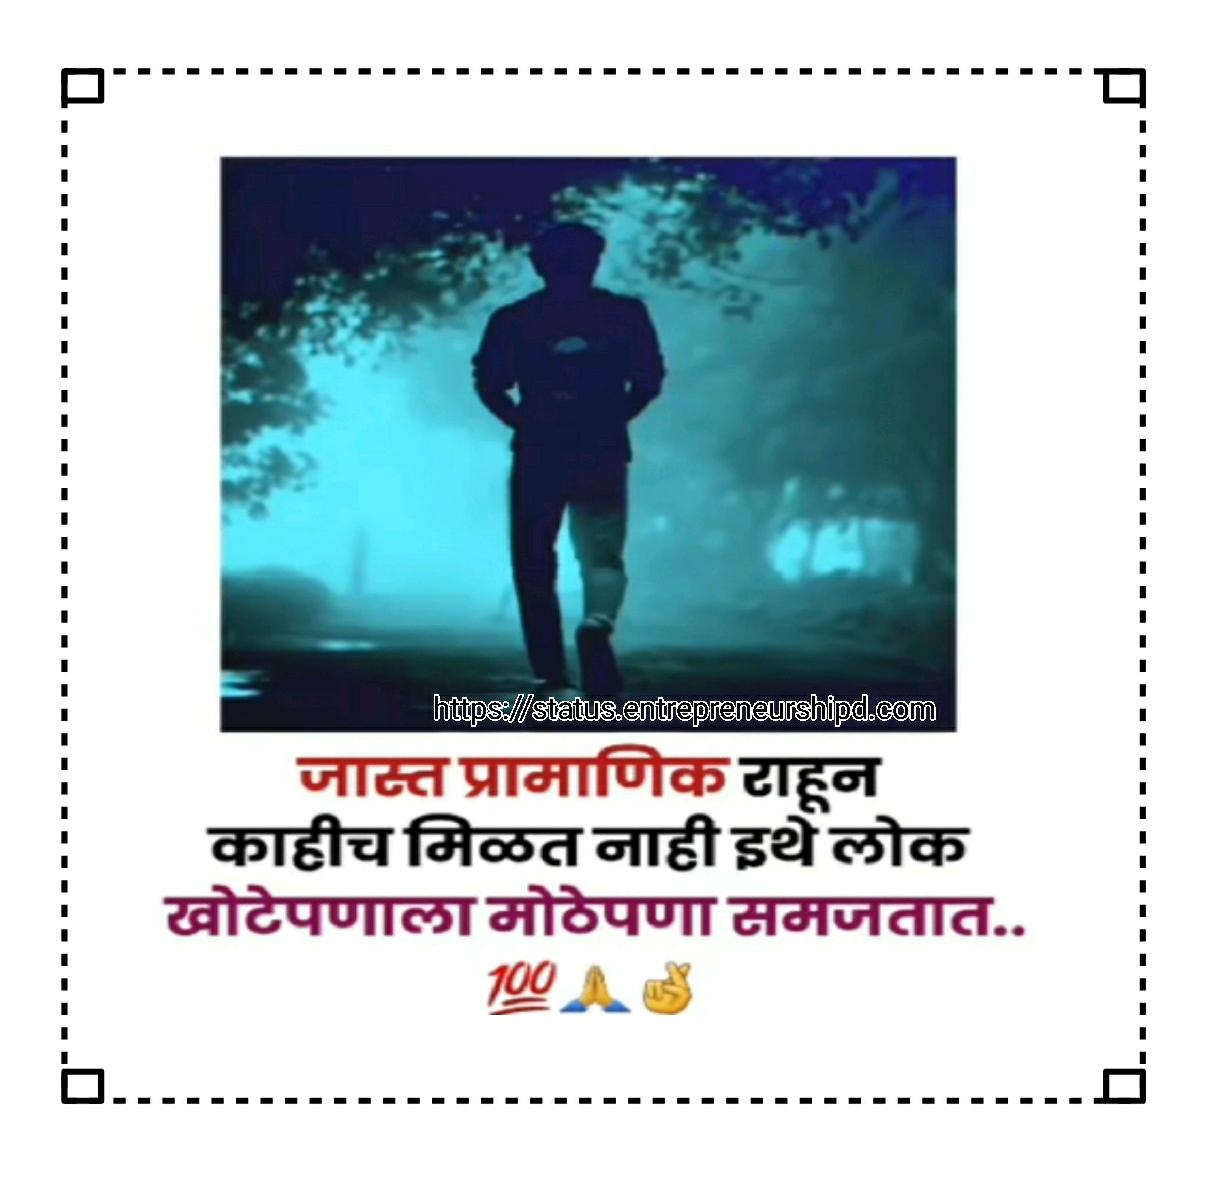 Marathi attitude status bhaigiri Fb marathi attitude status bhaigiri Marathi attitude status for boy text